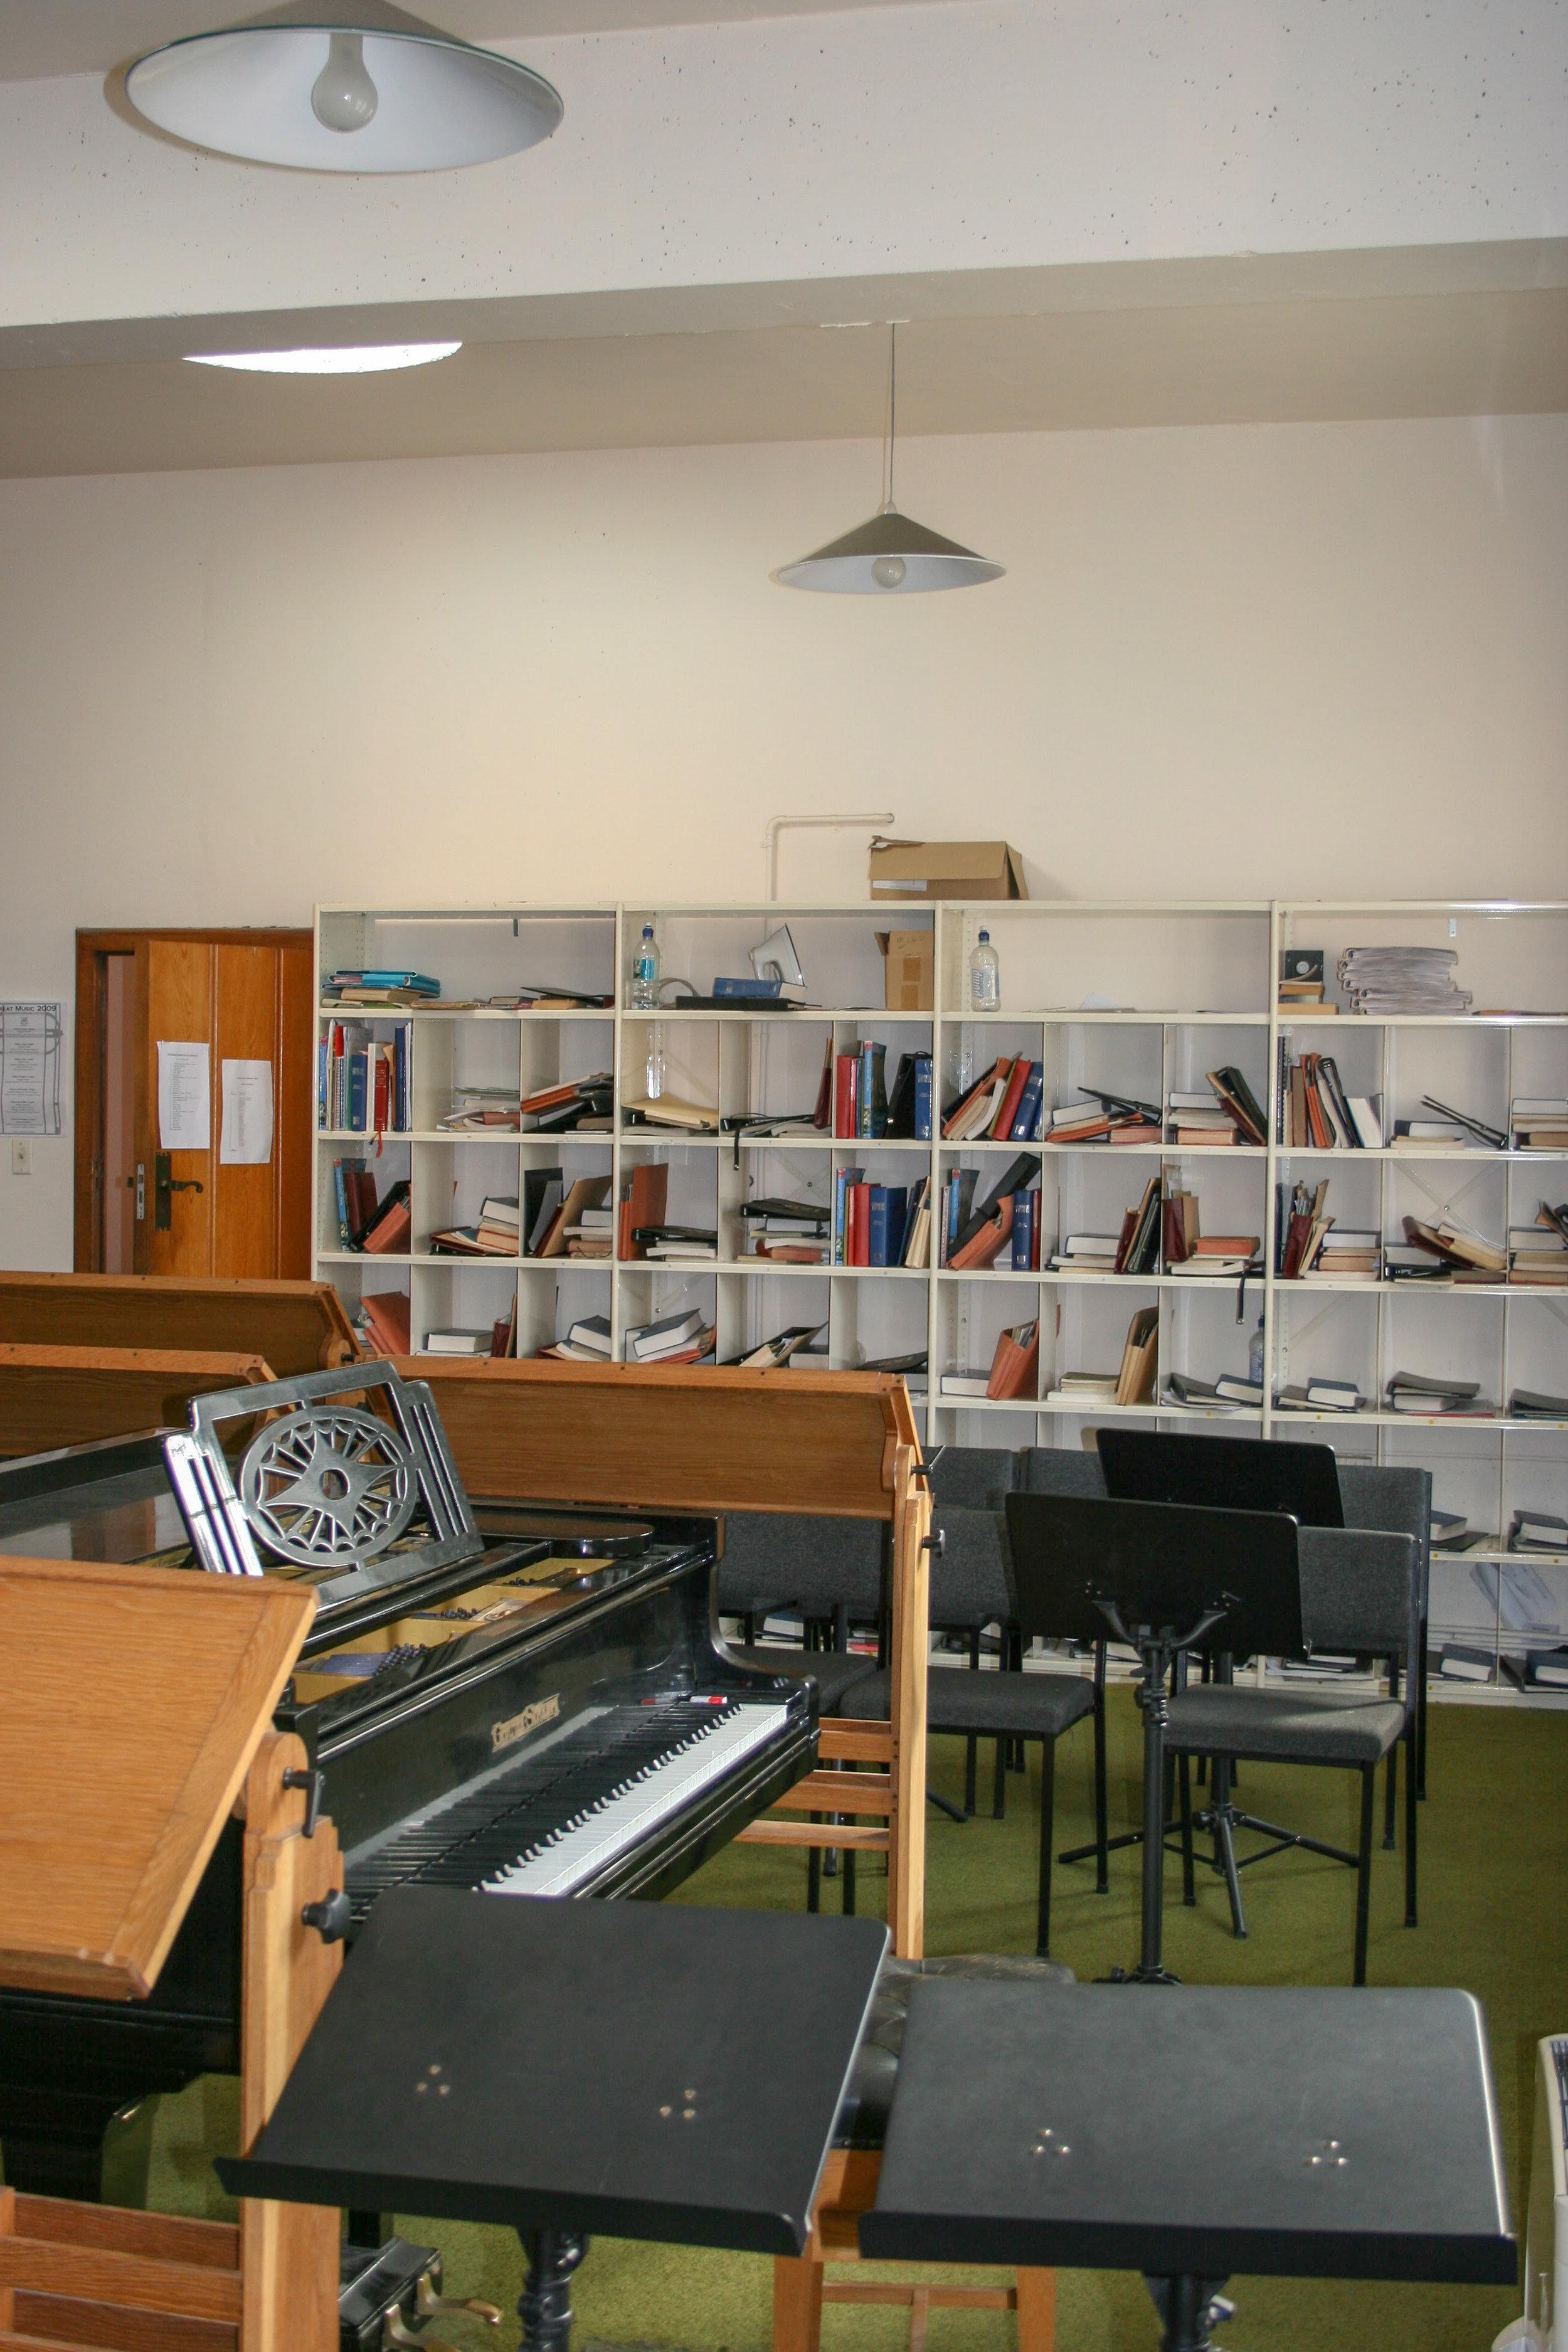 choir-room.jpg